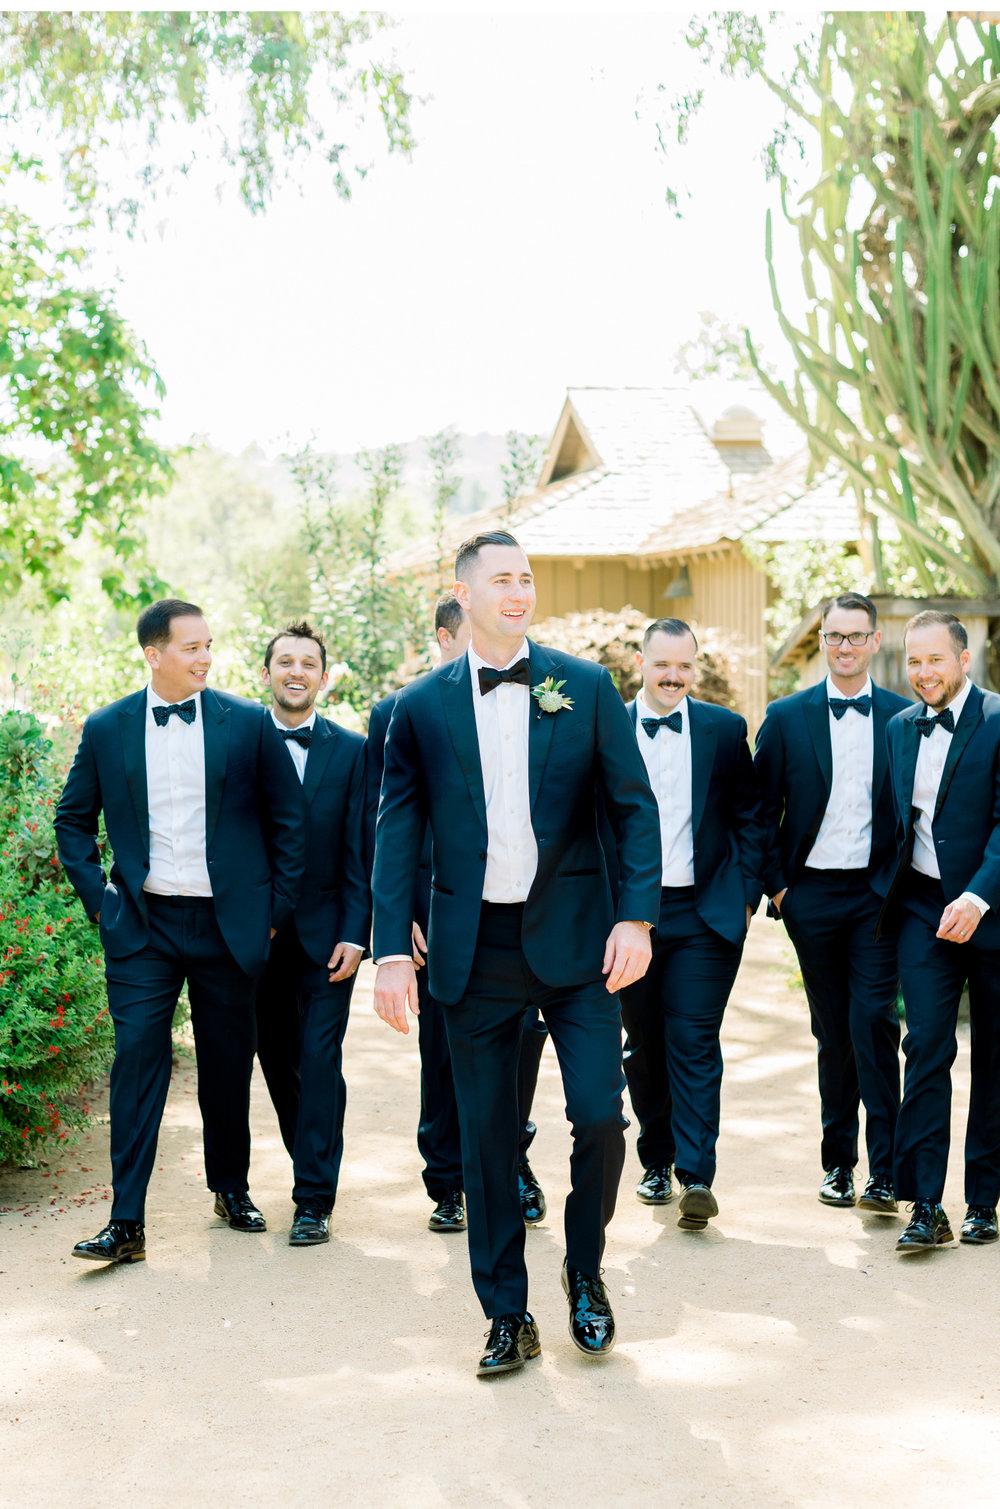 Southern-California-Weddings-Natalie-Schutt-Photography-Weddings_15.jpg